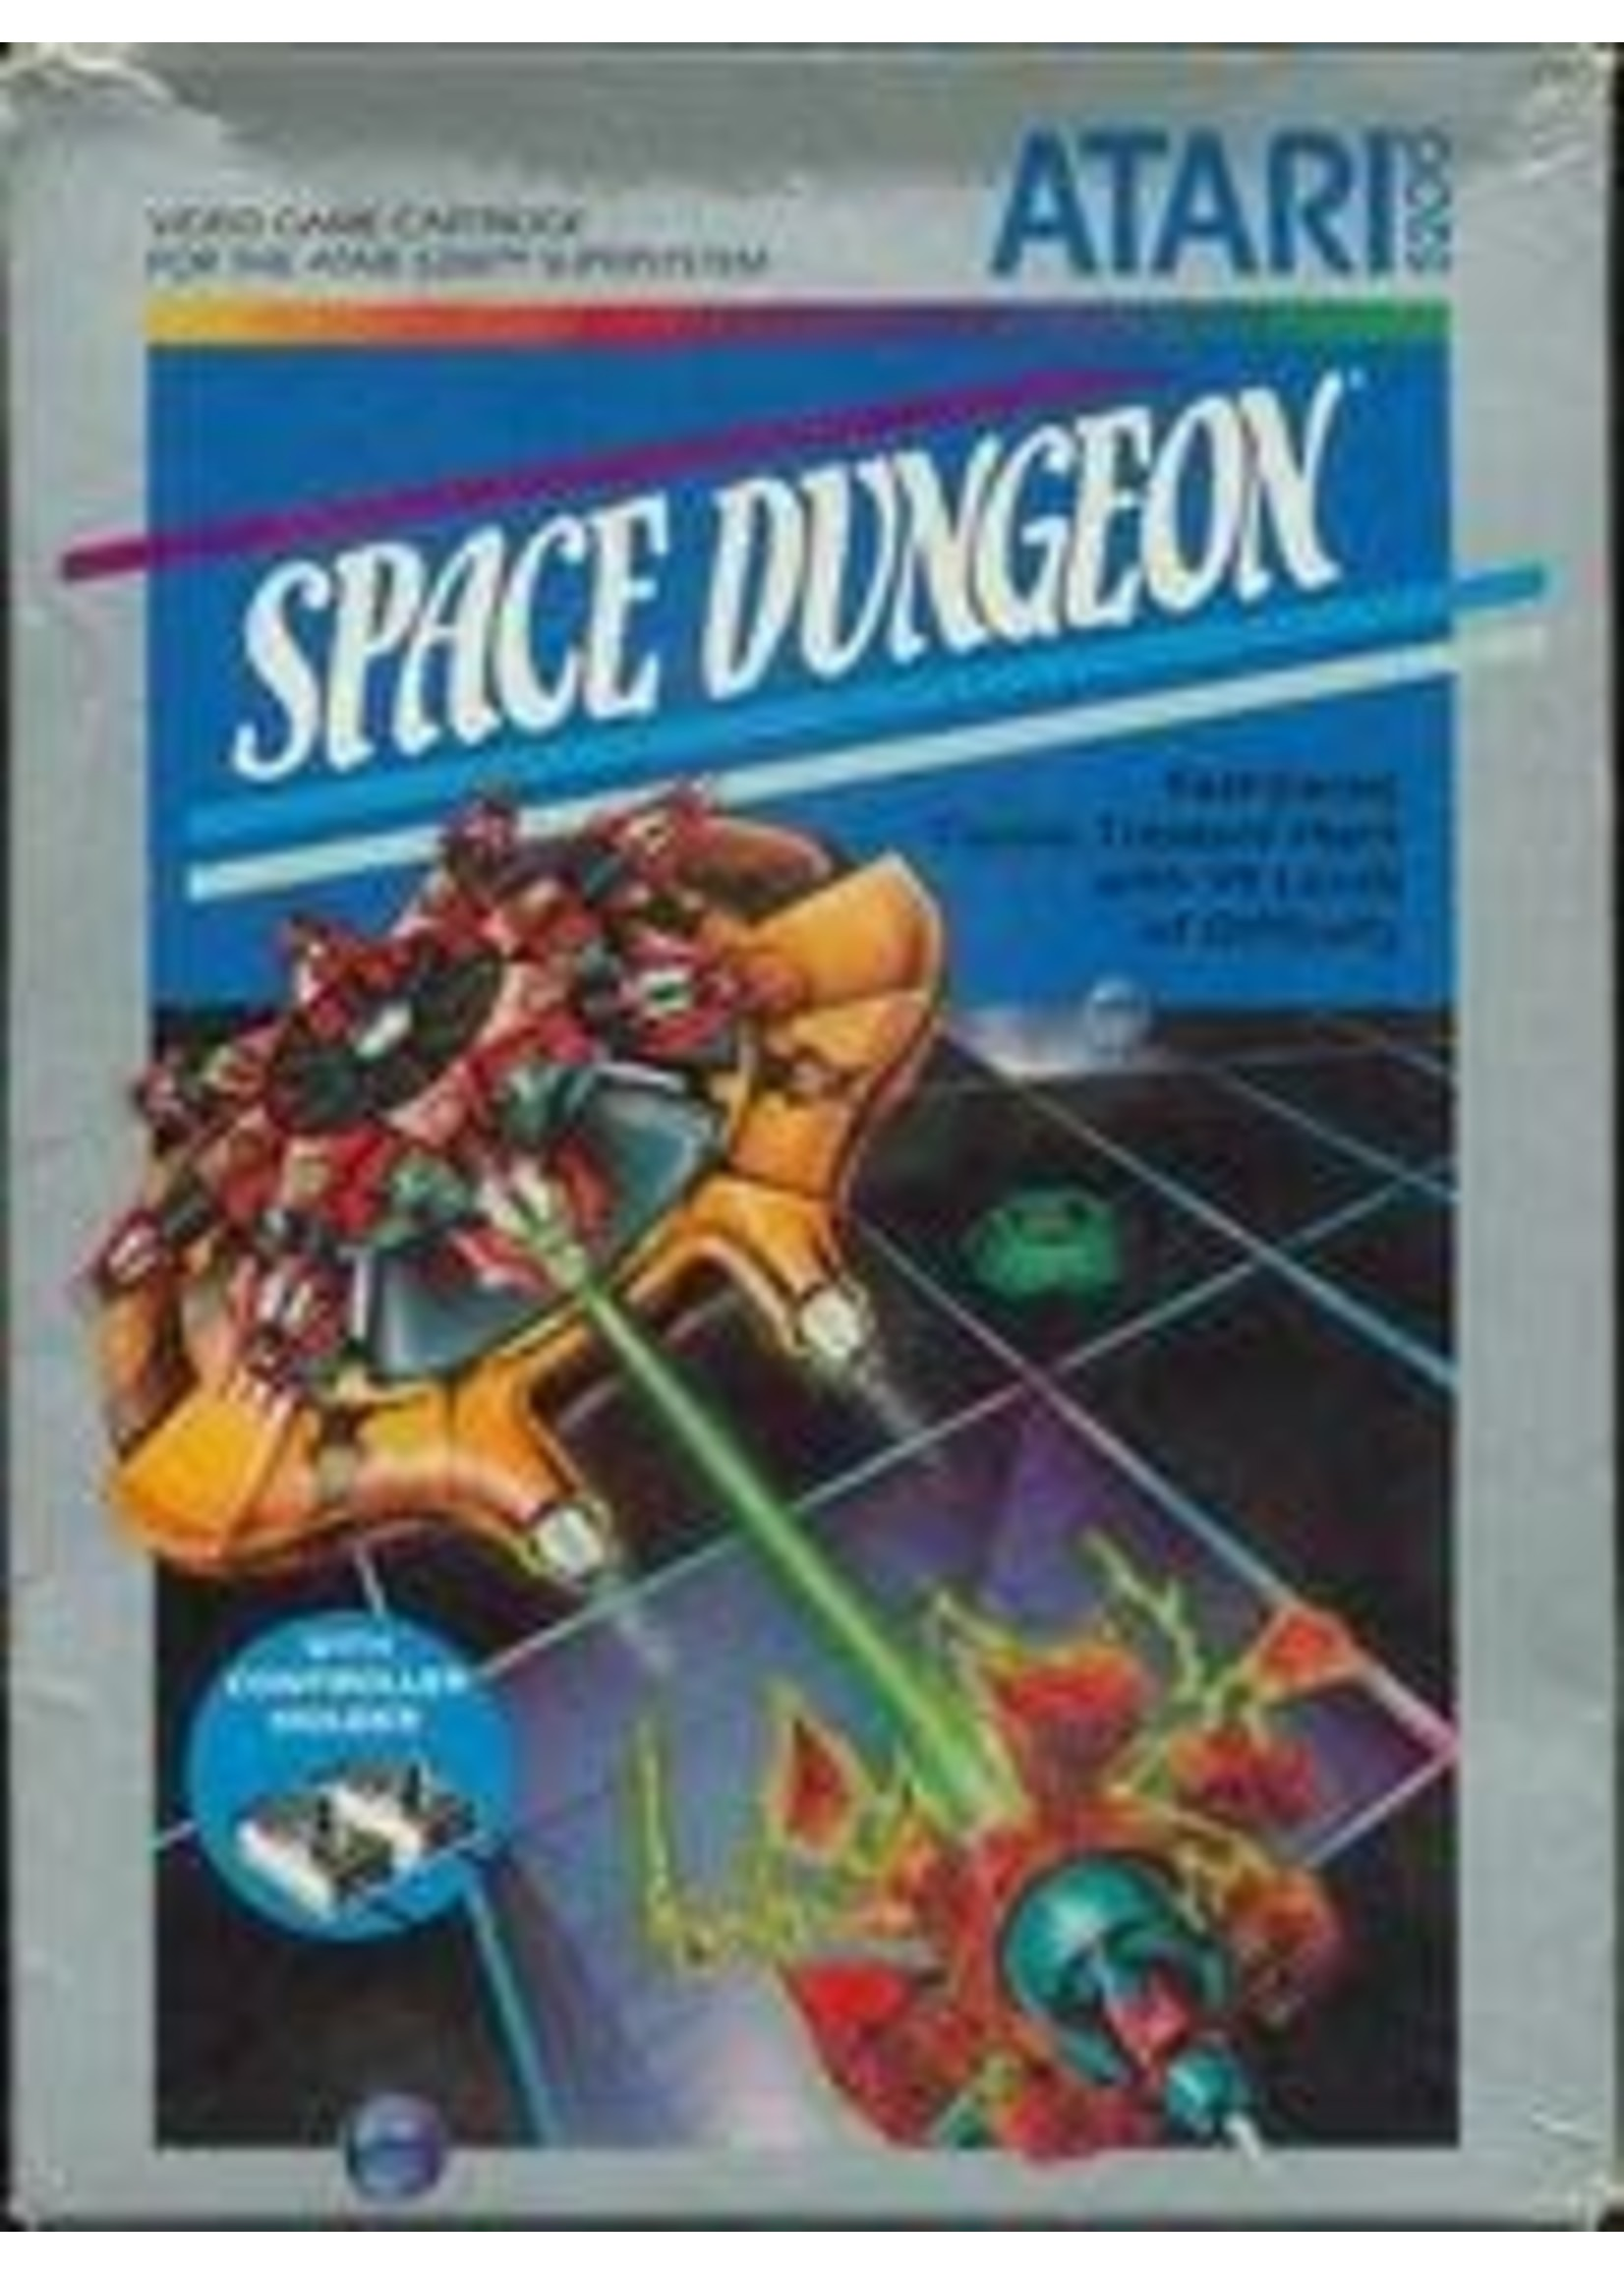 Space Dungeon Atari 5200